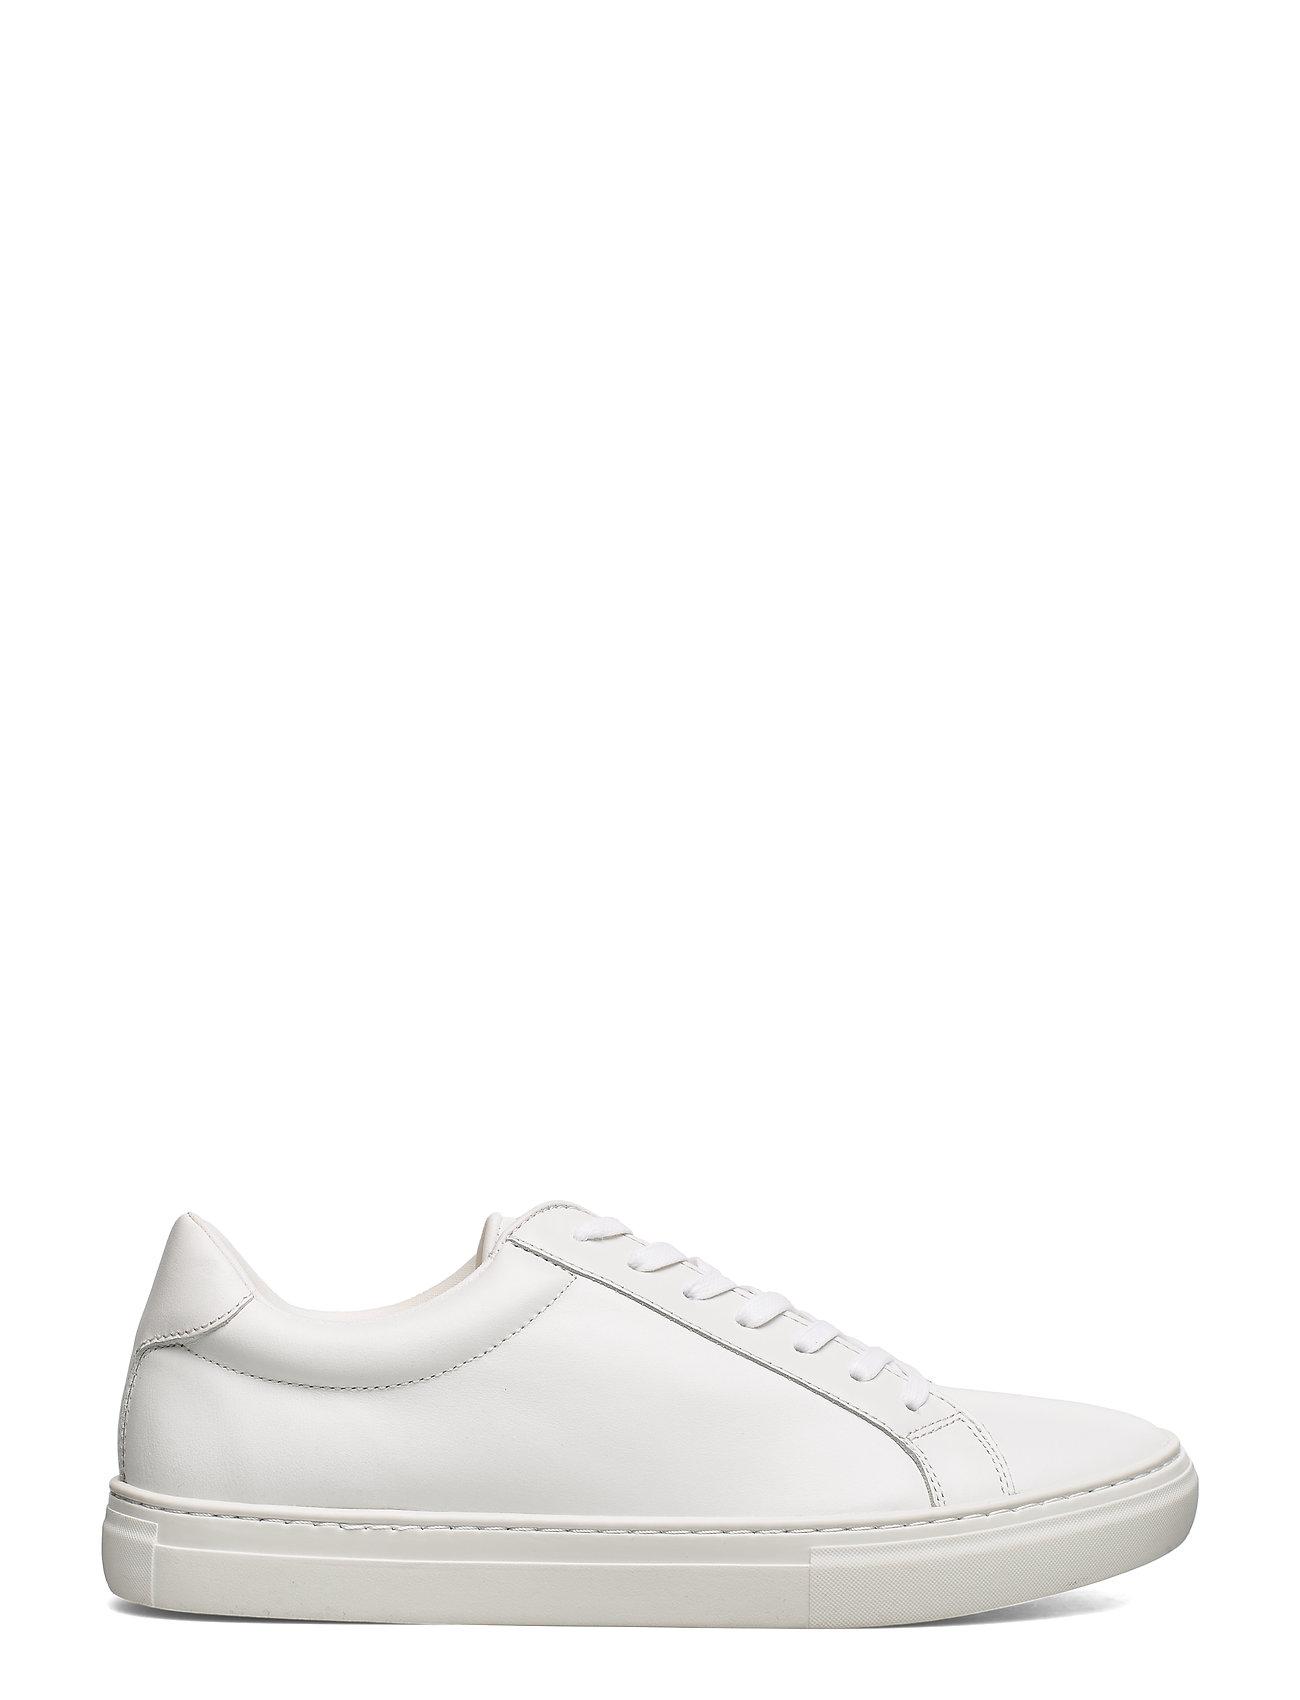 Image of Paul Low-top Sneakers Hvid VAGABOND (3307692305)